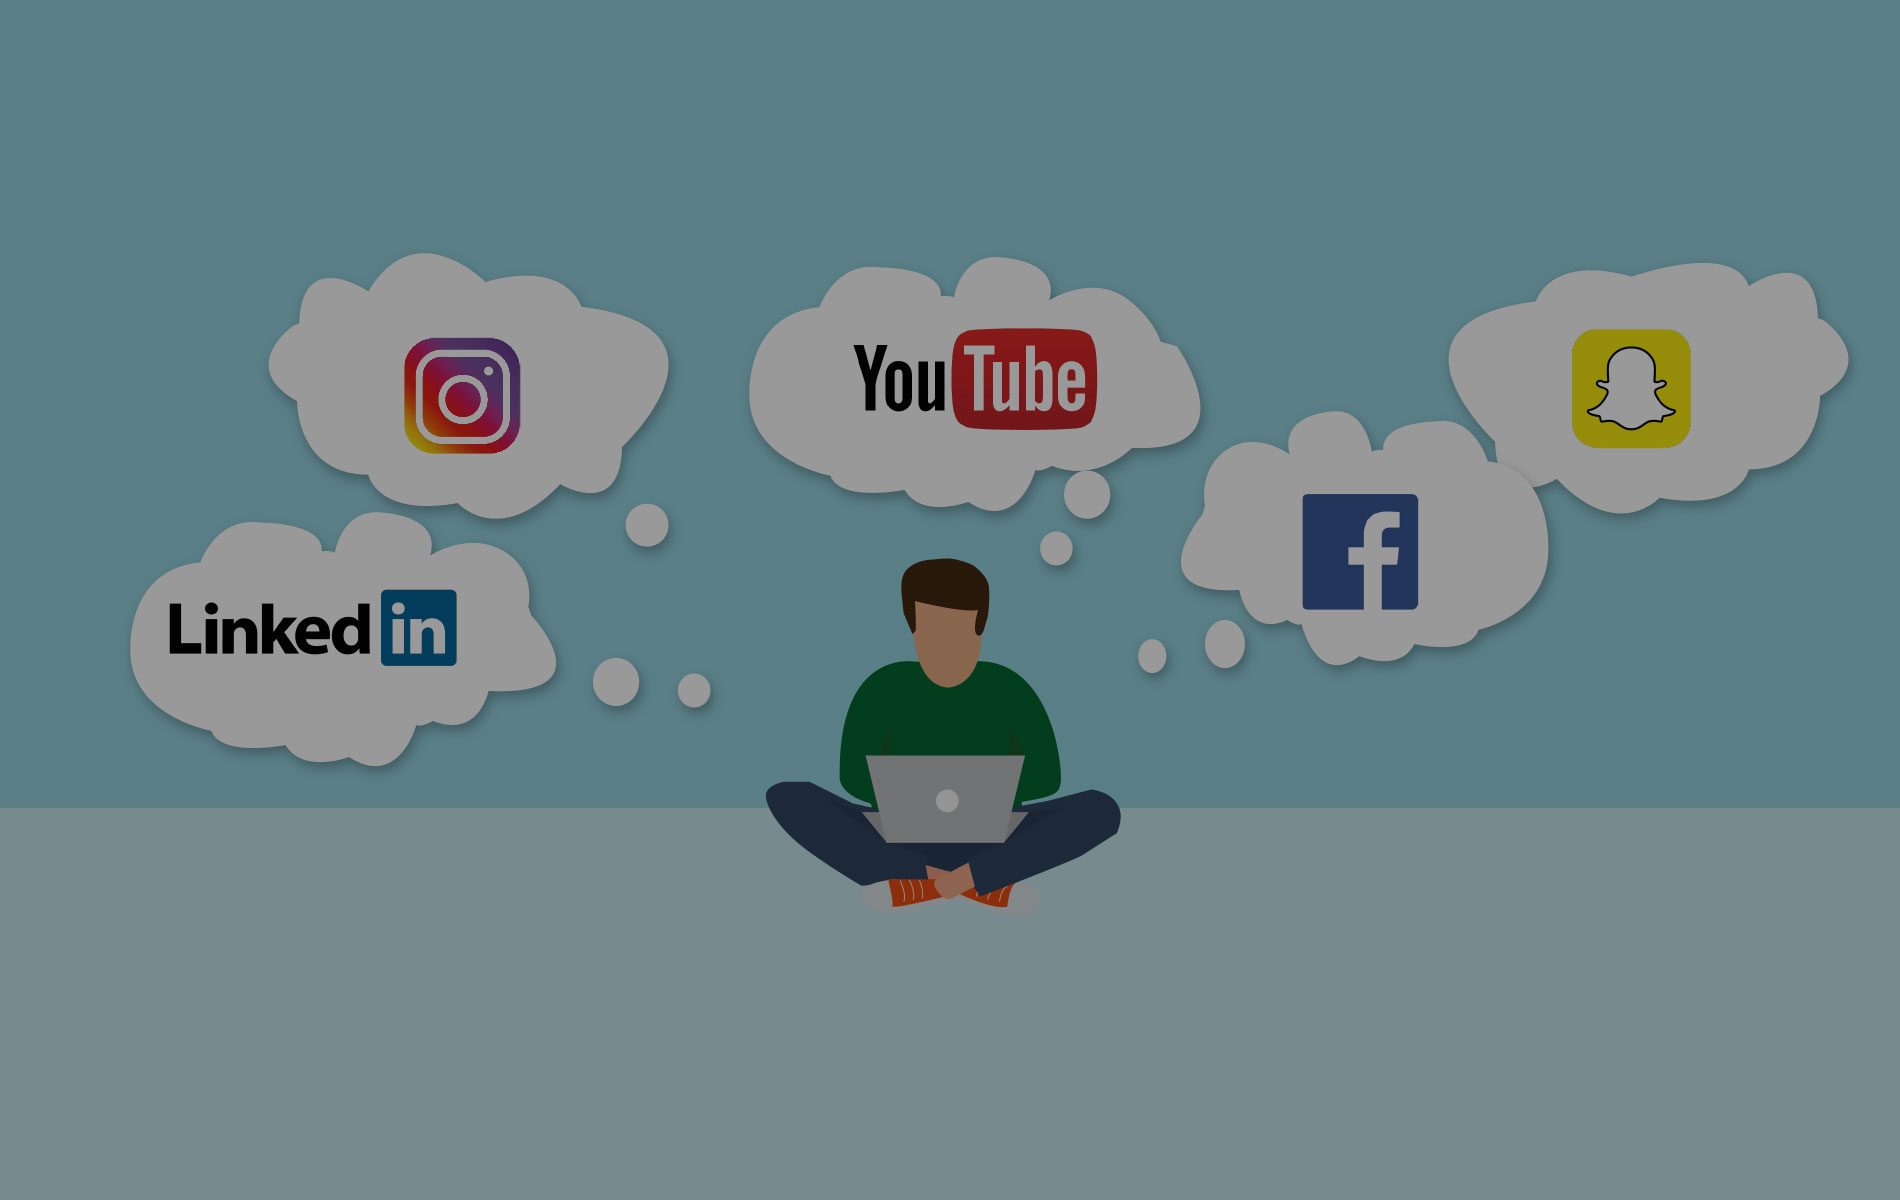 verschiedene clouds mit social media logos